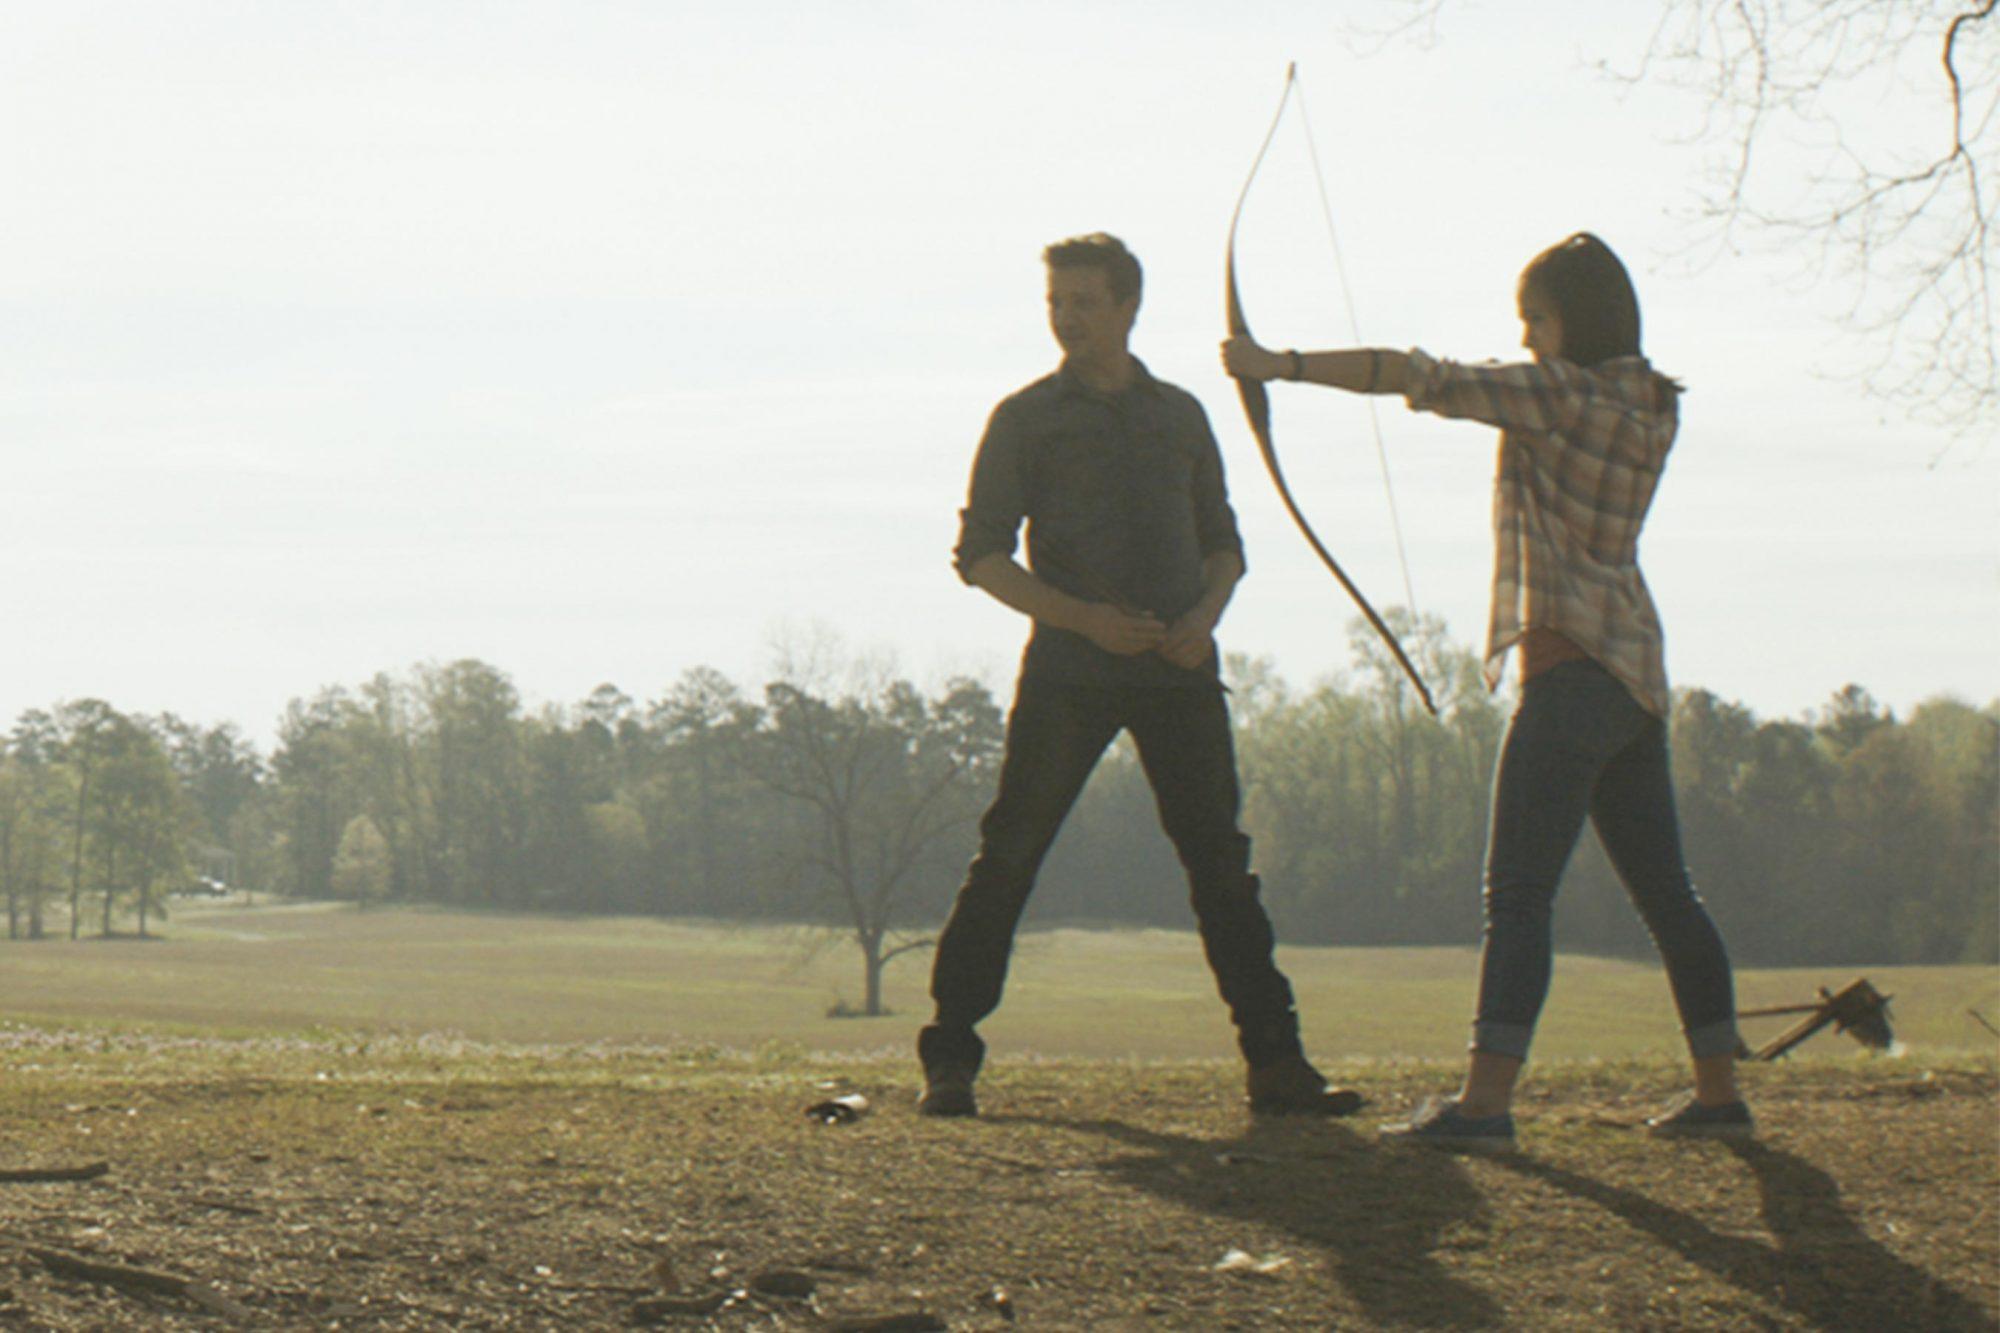 Marvel Studios' AVENGERS: ENDGAME..L to R: Hawkeye/Clint Barton (Jeremy Renner) and daughter (Sophia Russo)..Photo: Film Frame..©Marvel Studios 2019